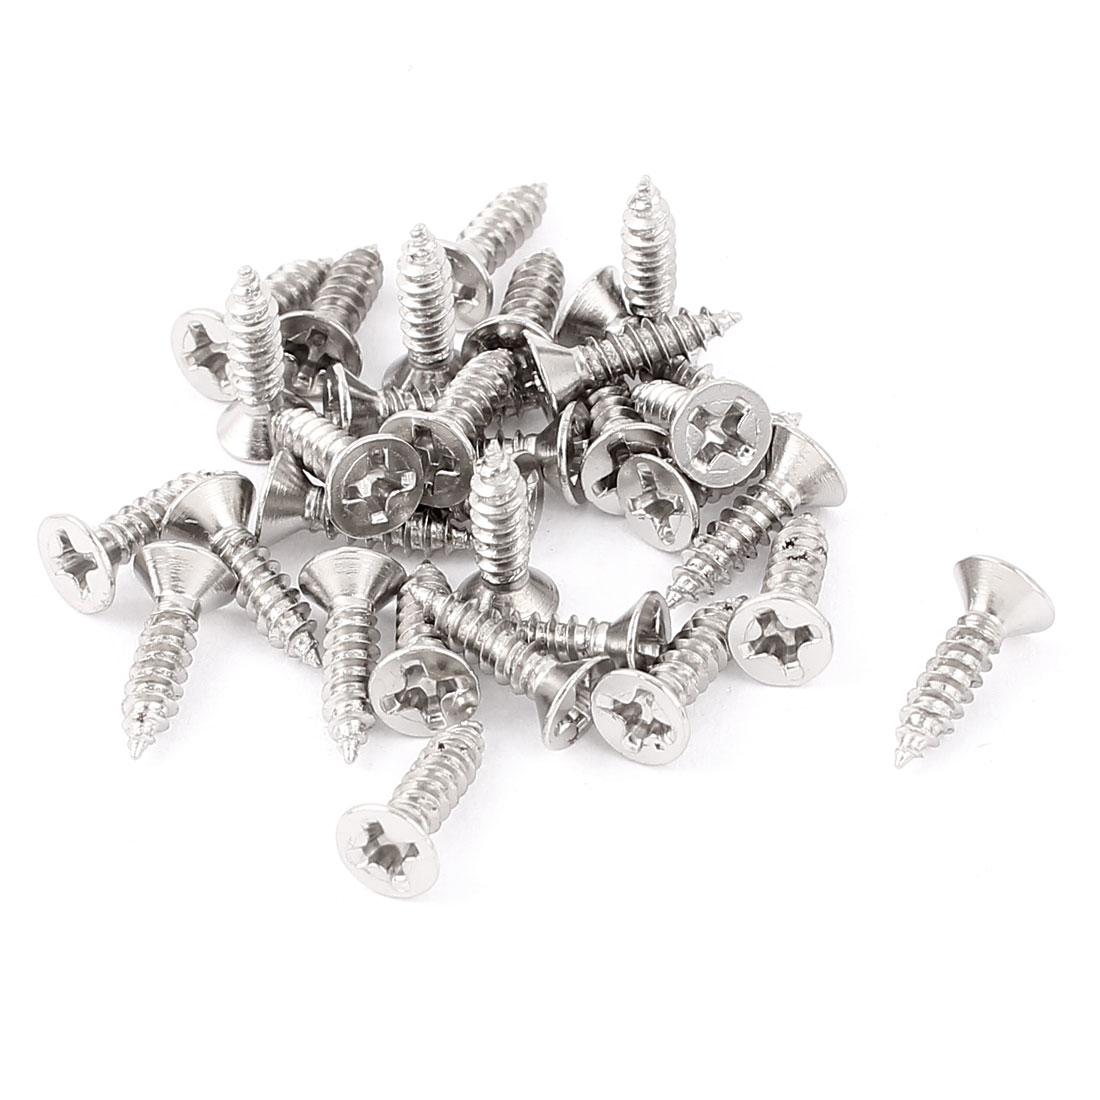 30pcs Stainless Steel Machine Phillips Flat Head Screws